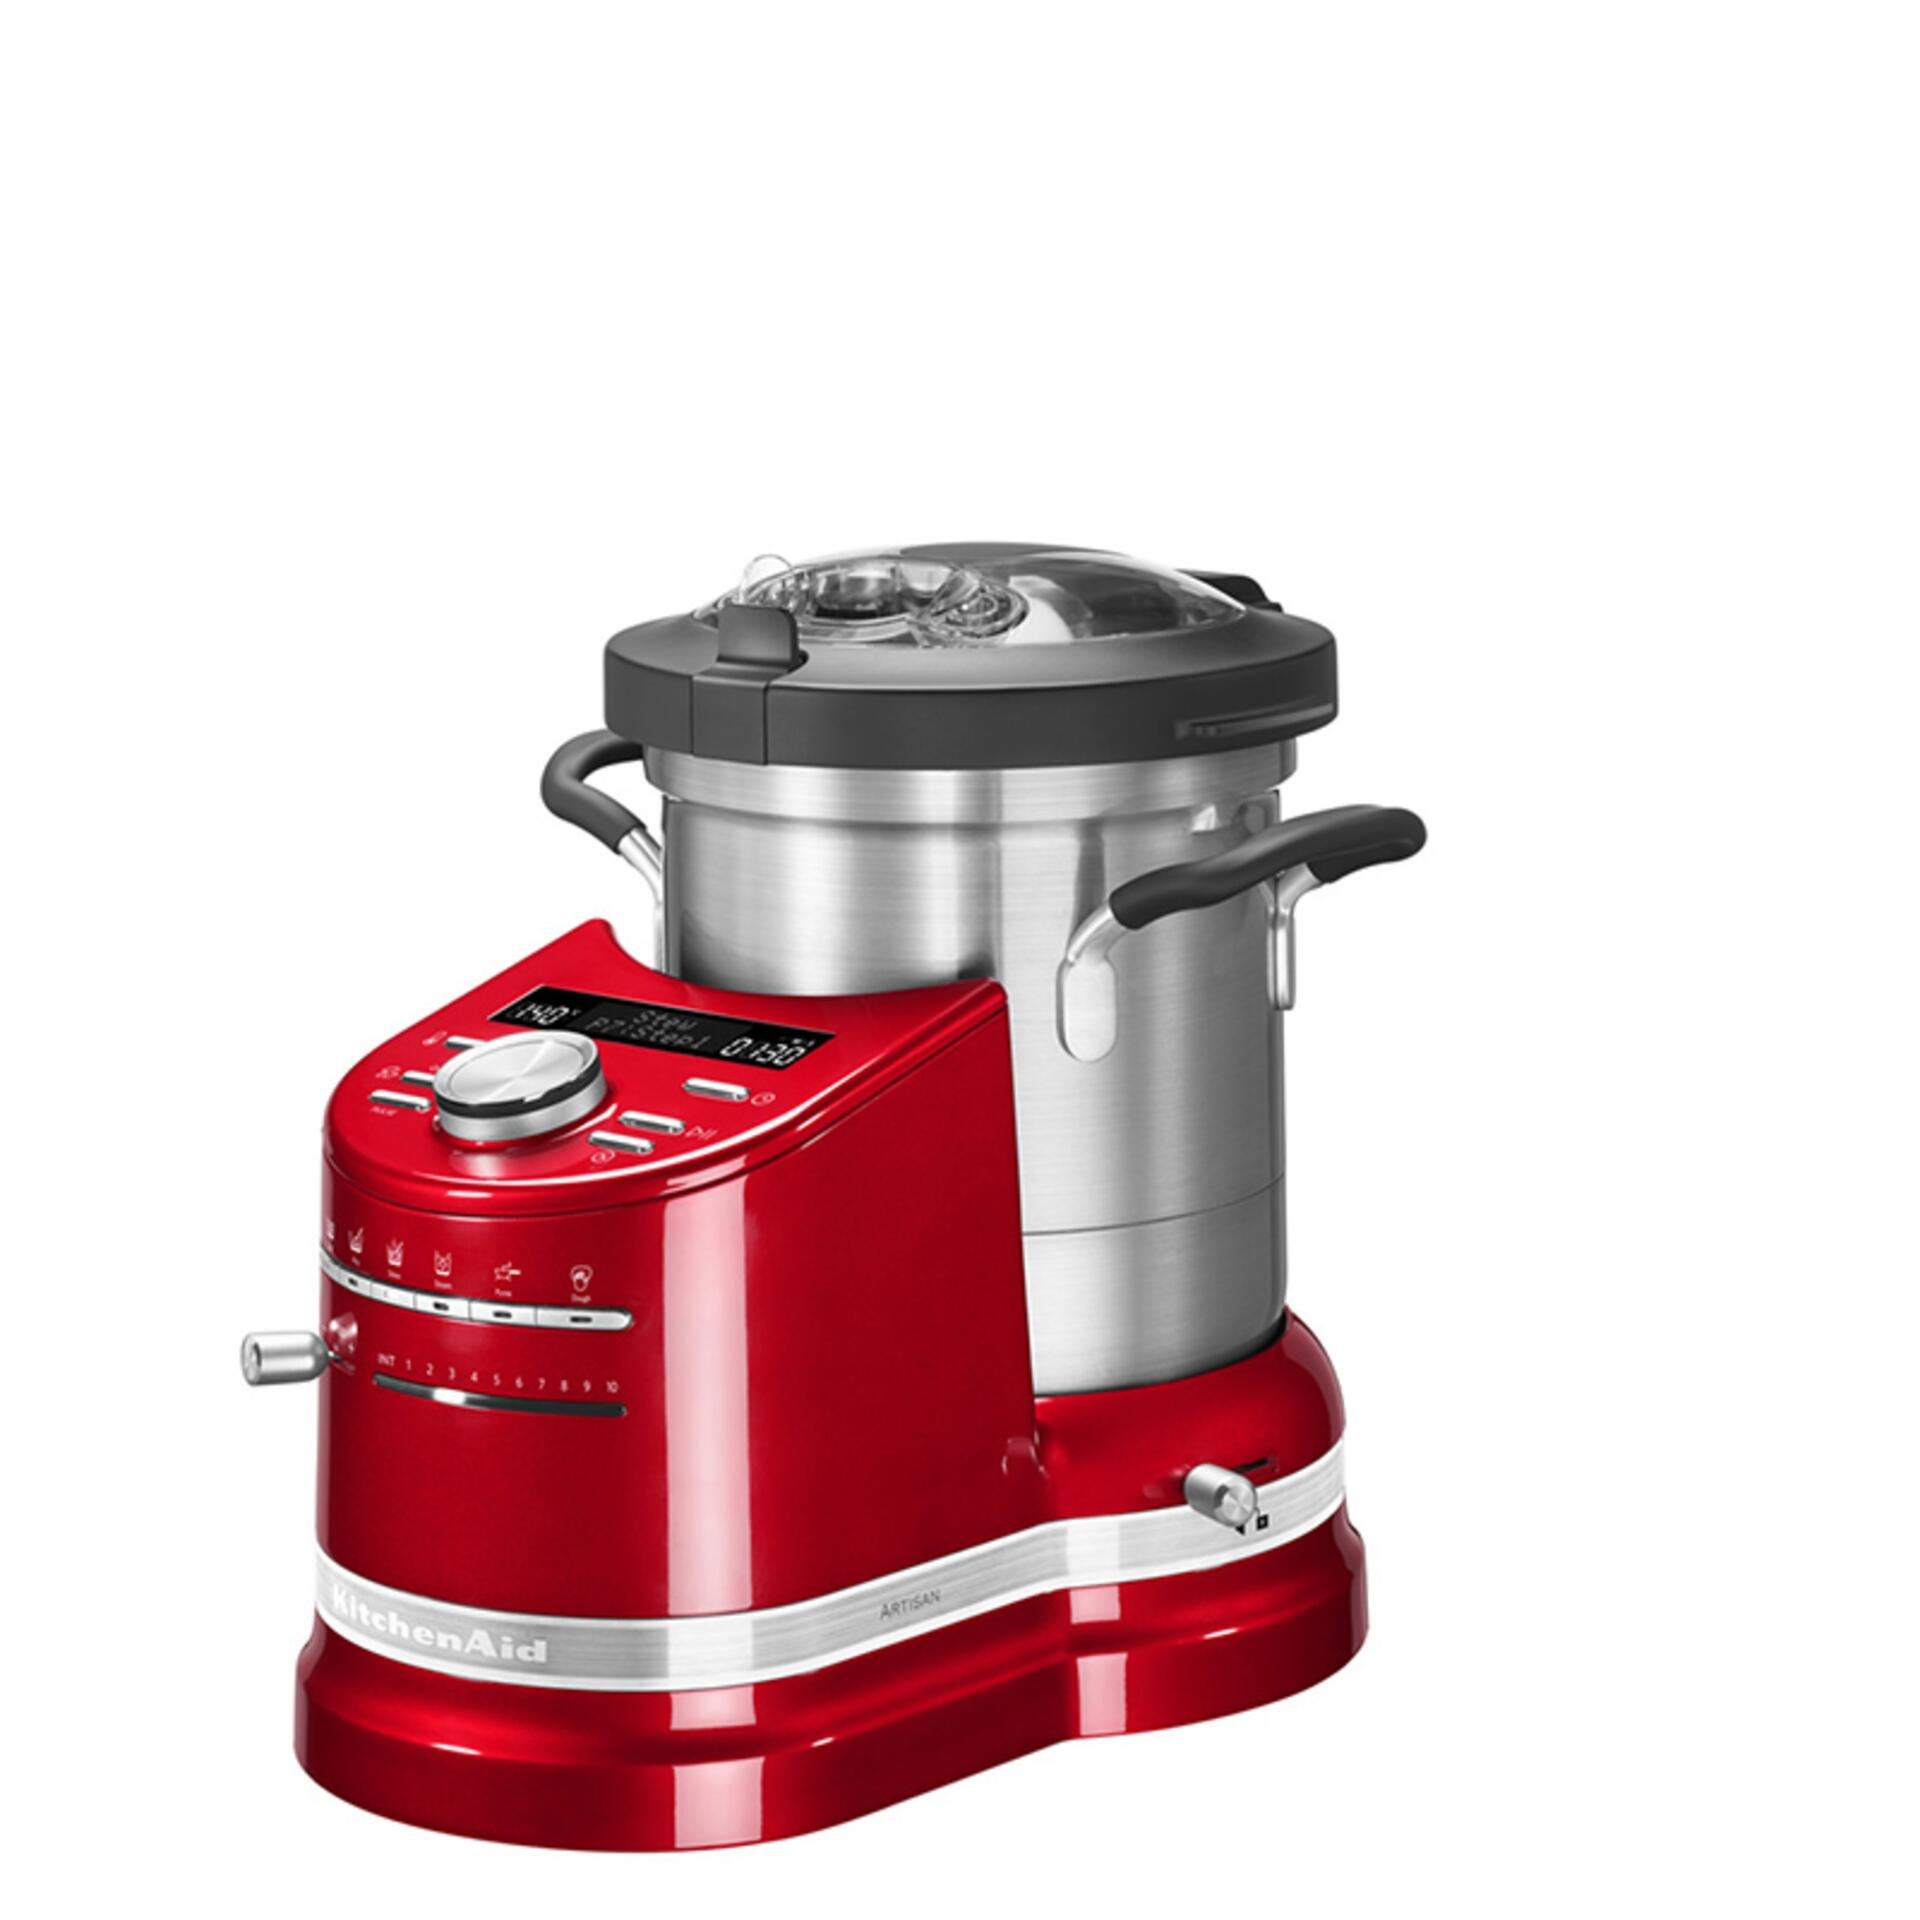 KitchenAid Artisan Cook Processor 5KCF0103EER/4 Empire Red